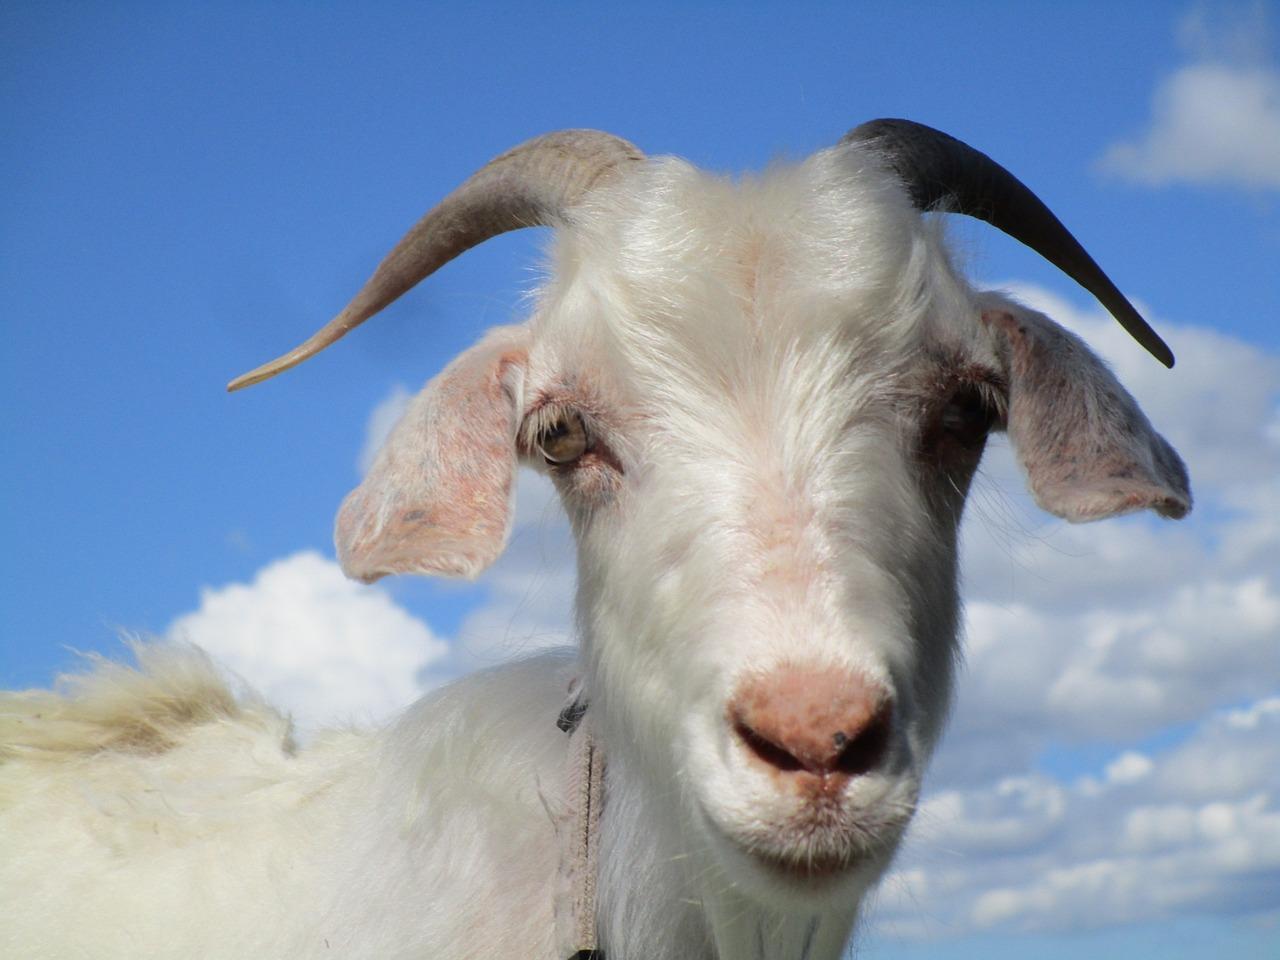 картинки козы картинки козы говорят